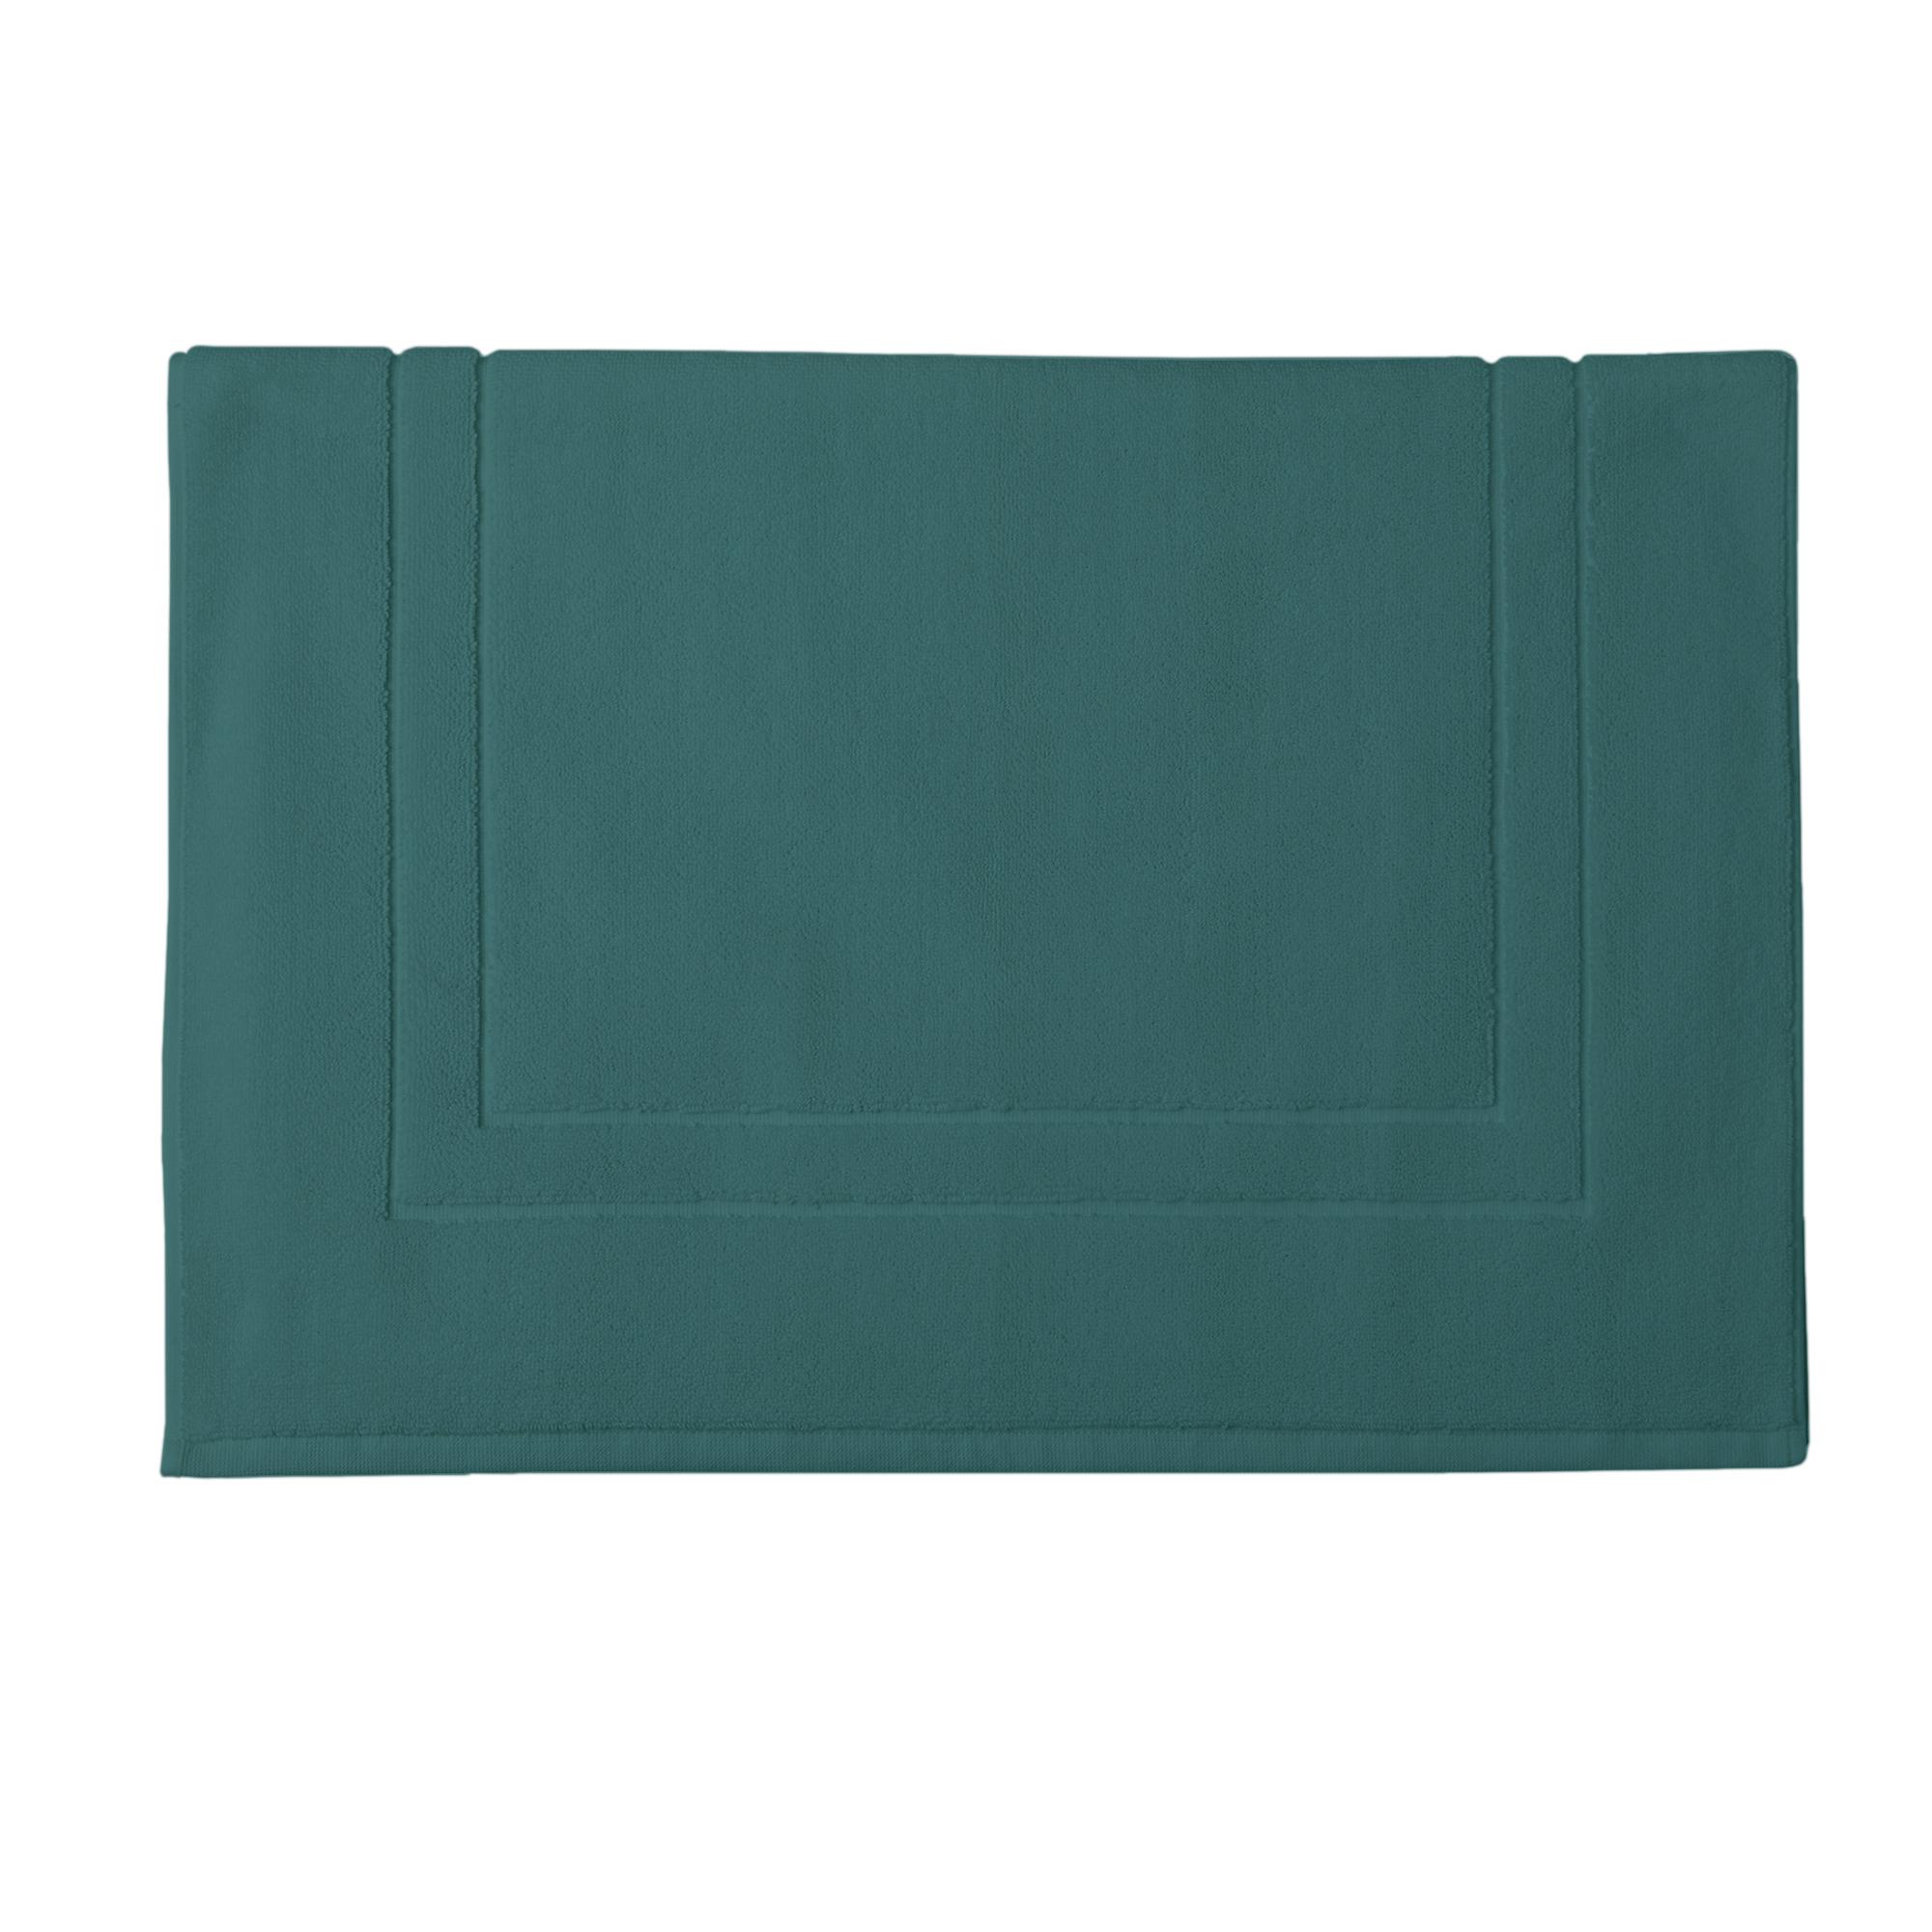 Tapis de bain en coton vert maquis 60x90